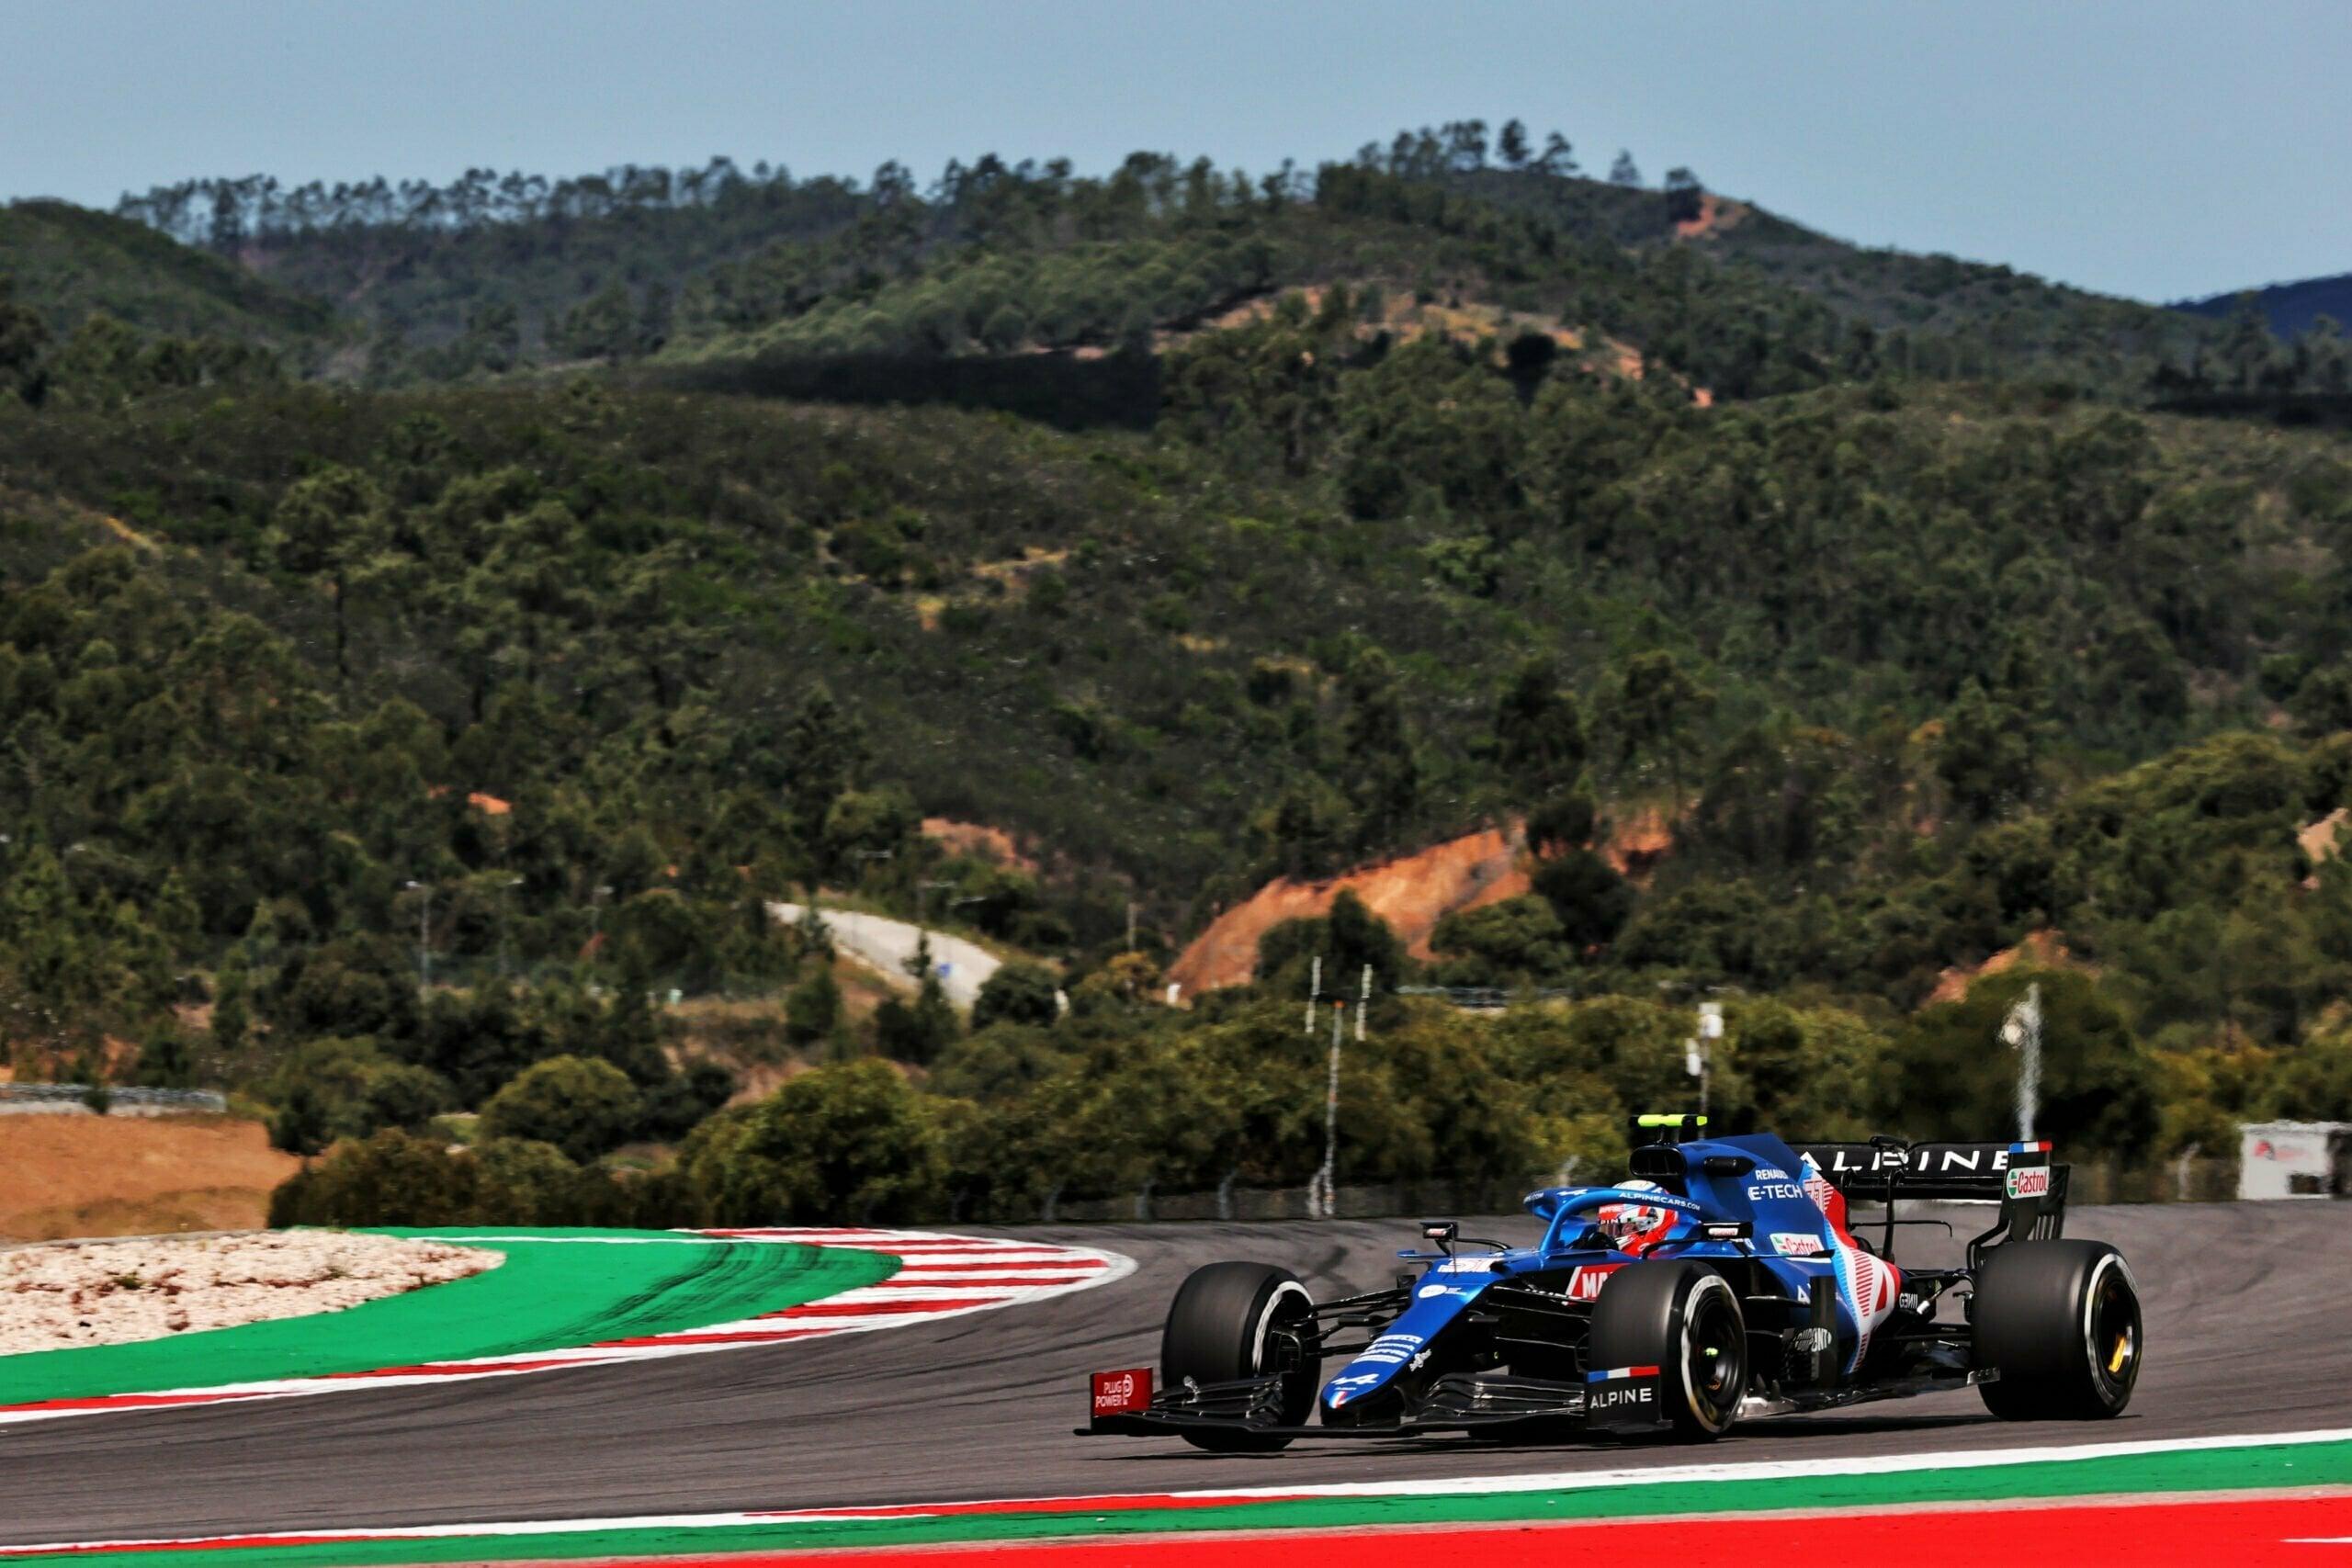 Alpine F1 Team GRAND PRIX HEINEKEN DU PORTUGAL Alonso Ocon 2021 A521 23 scaled   Alpine F1 Team : des essais convaincants au Grand Prix Heineken du Portugal